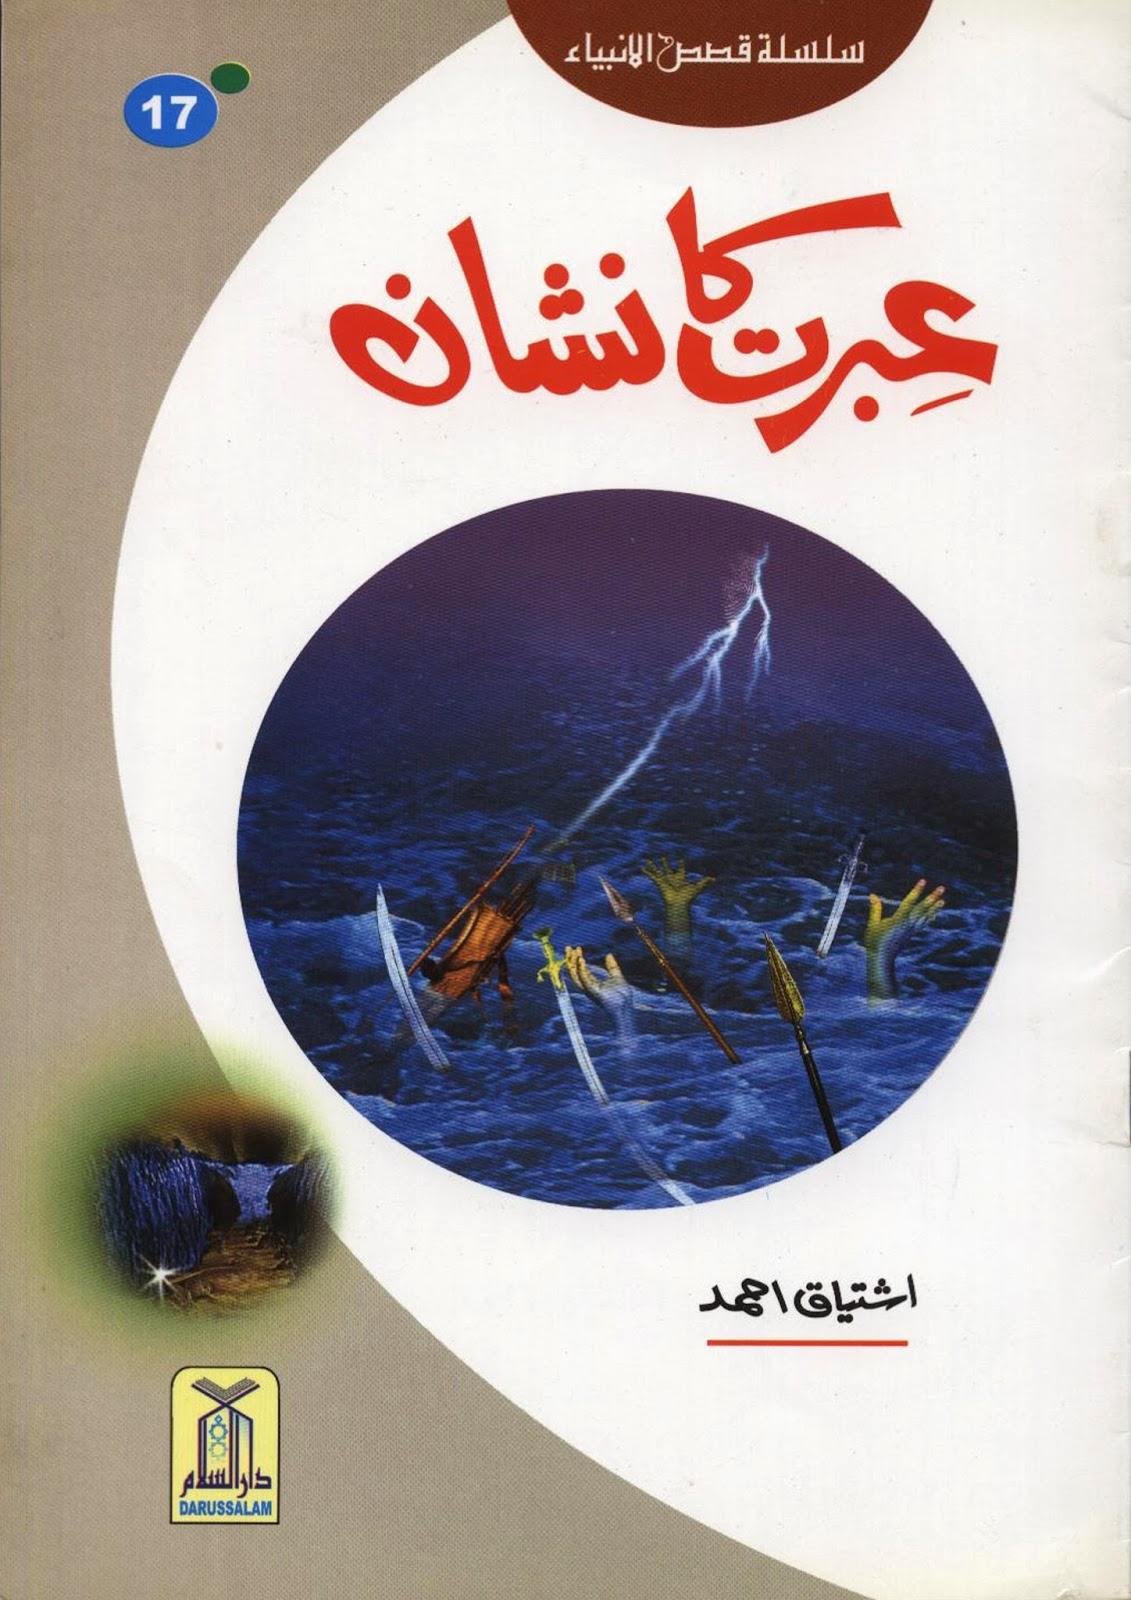 http://urduguru1.blogspot.com/2014/03/ebrat-ka-neshan-prophet-musa-as.html